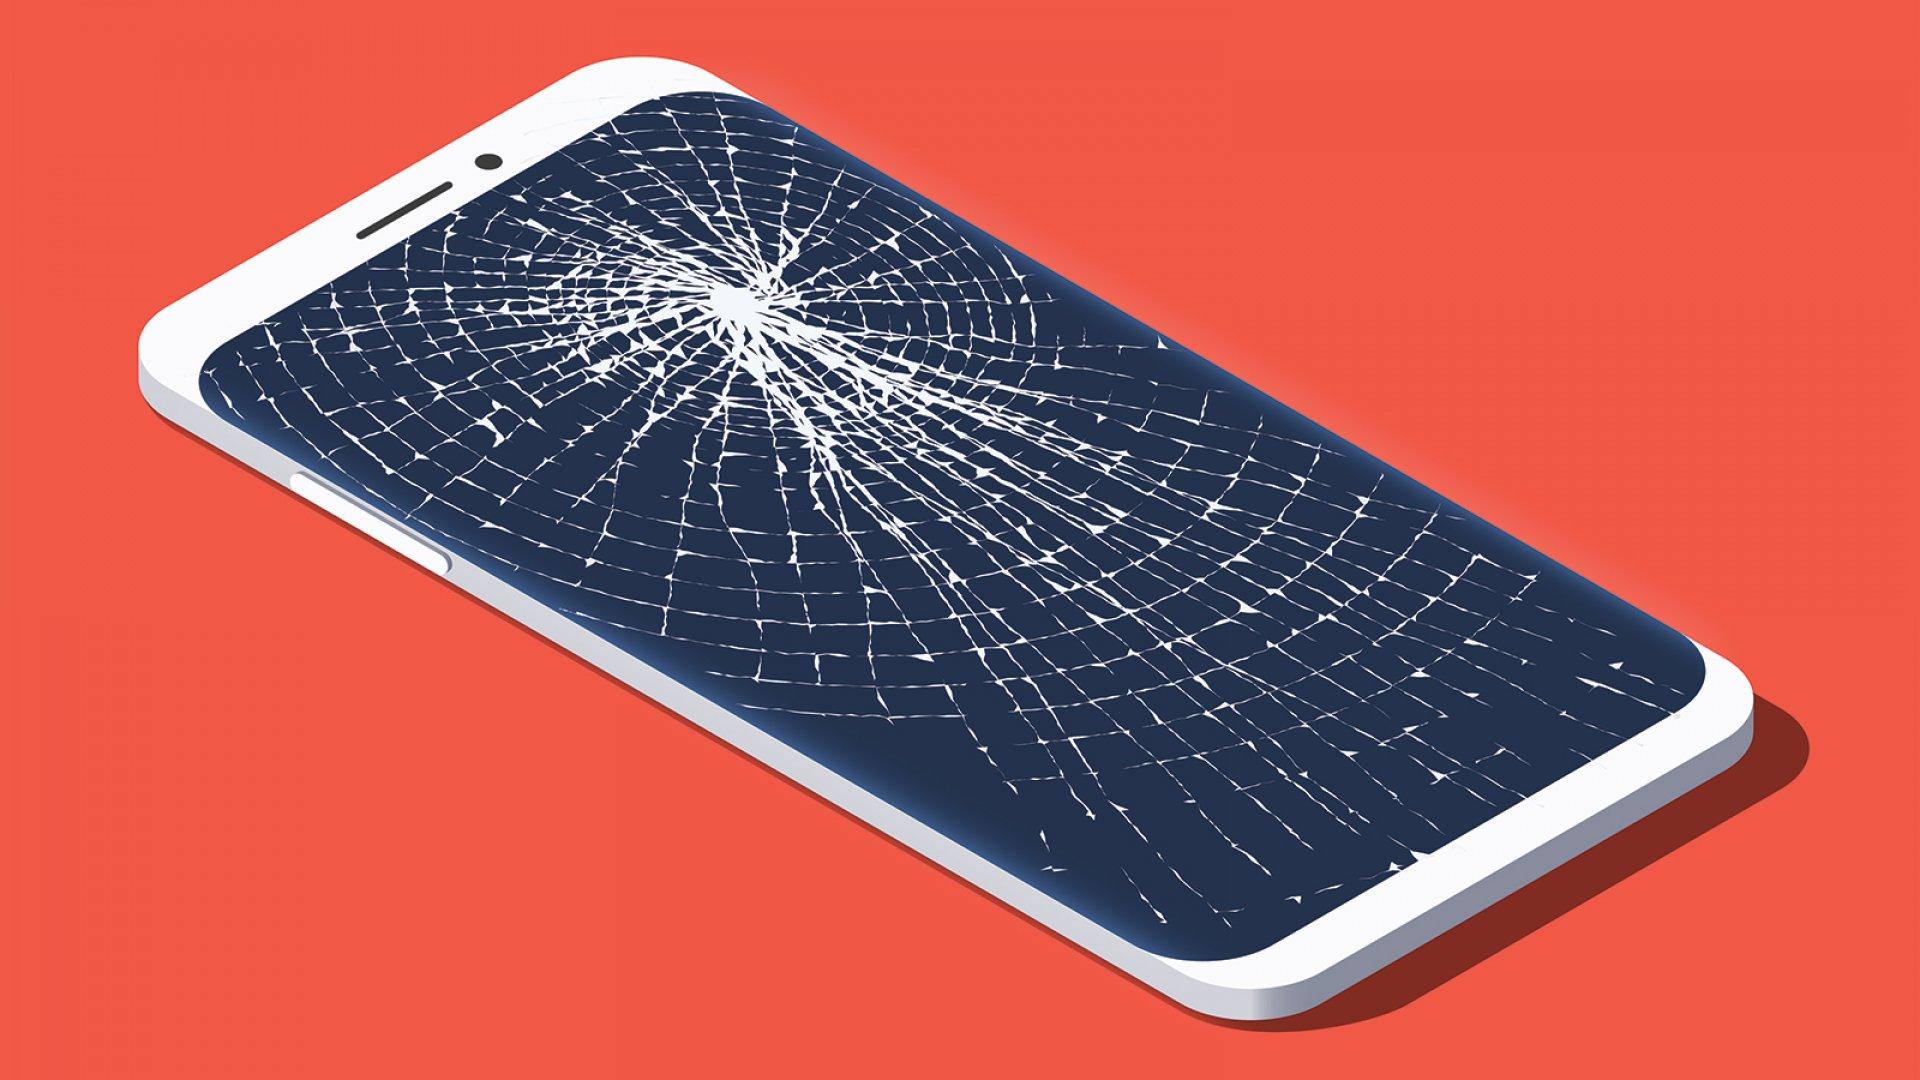 The 5 Biggest Corporate Social Media Fails of 2018